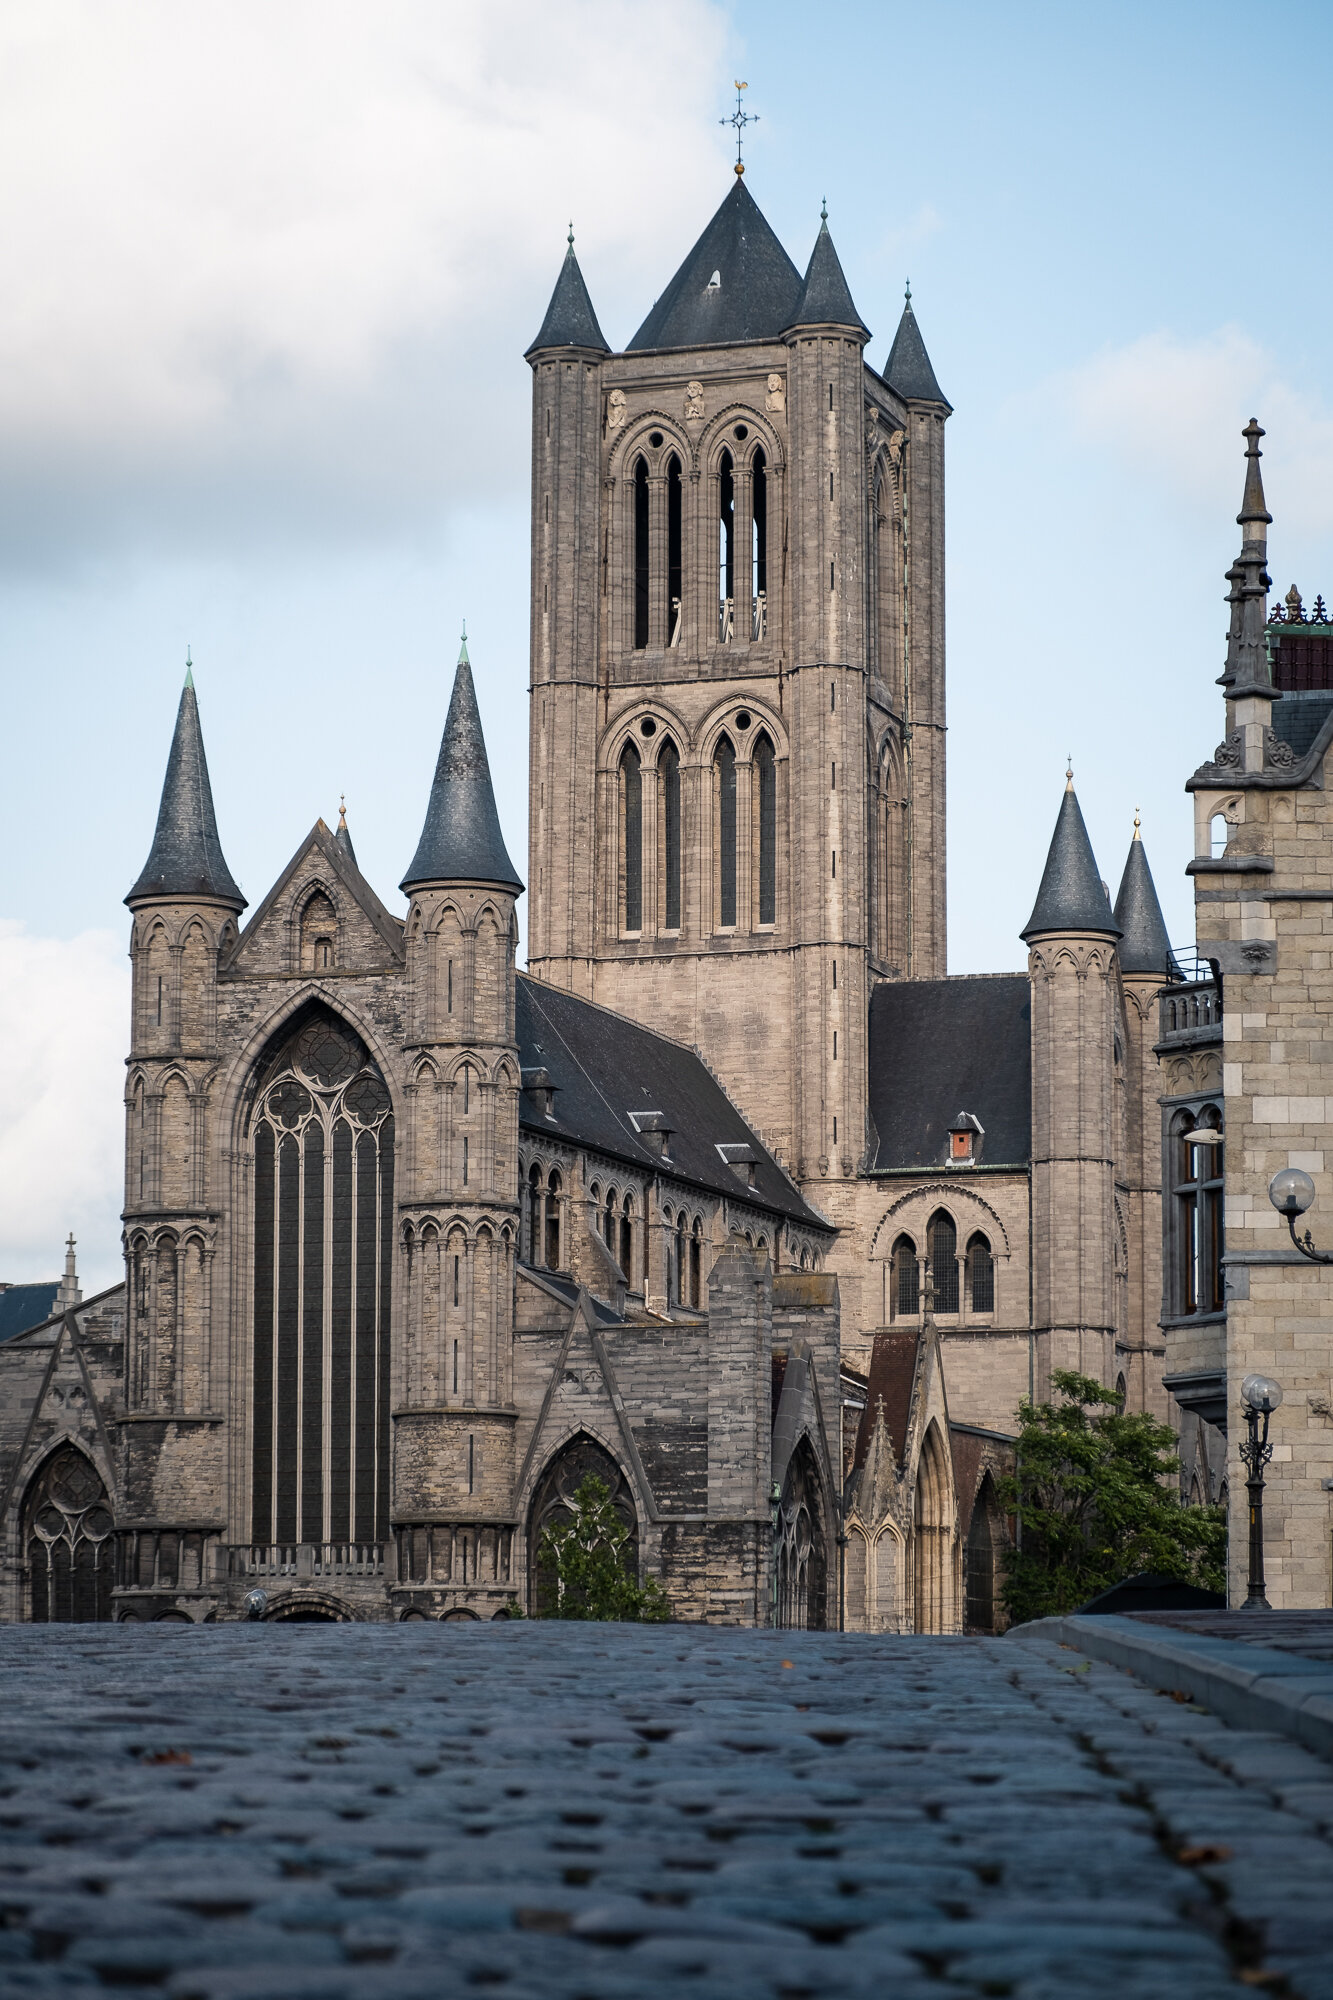 St. Nicholas' Church from Saint Michael's Bridge